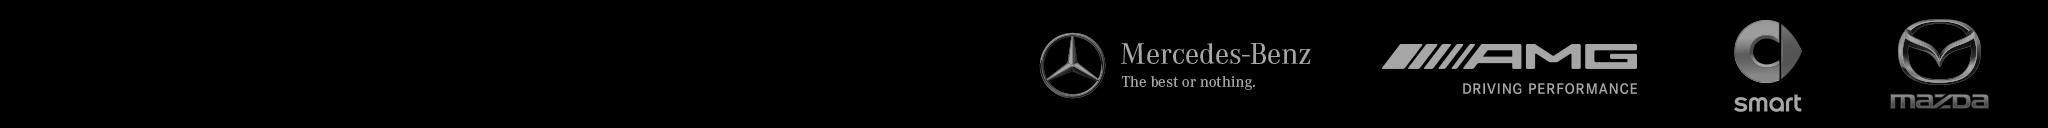 Mercedes-Benz, AMG, Smart, Mazda